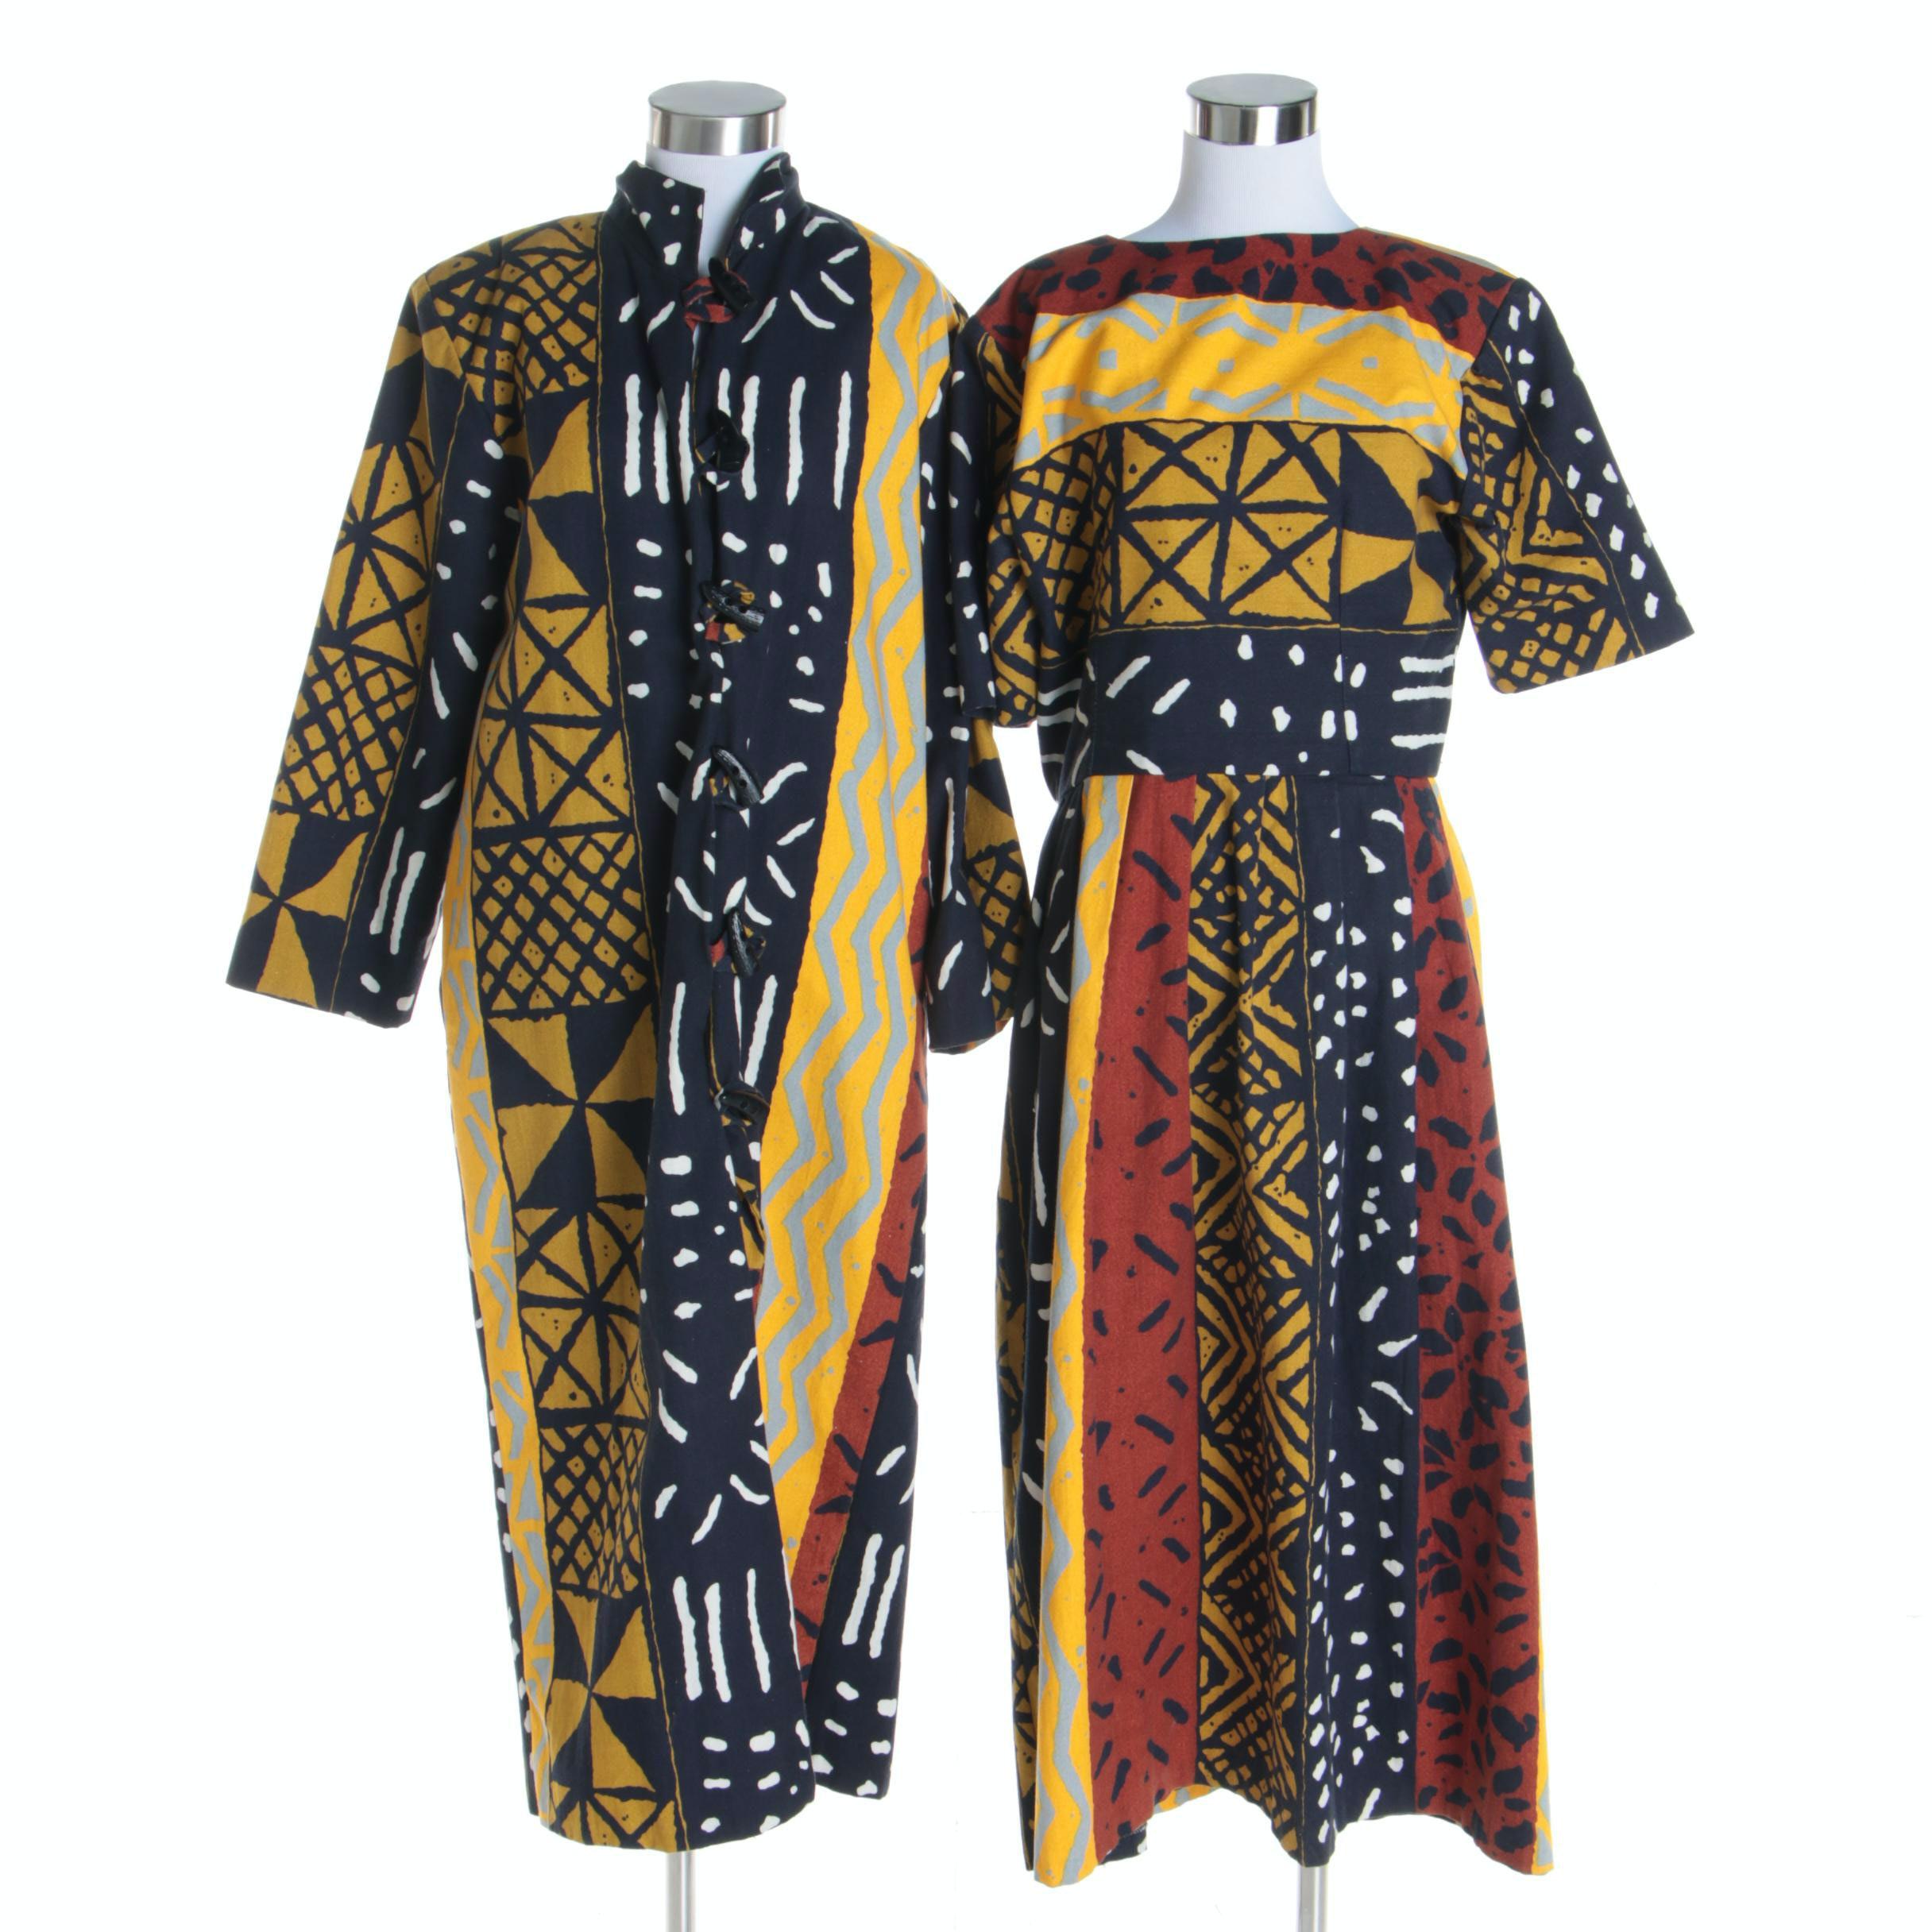 Women's Vintage Handmade African Mudcloth-Style Ensemble